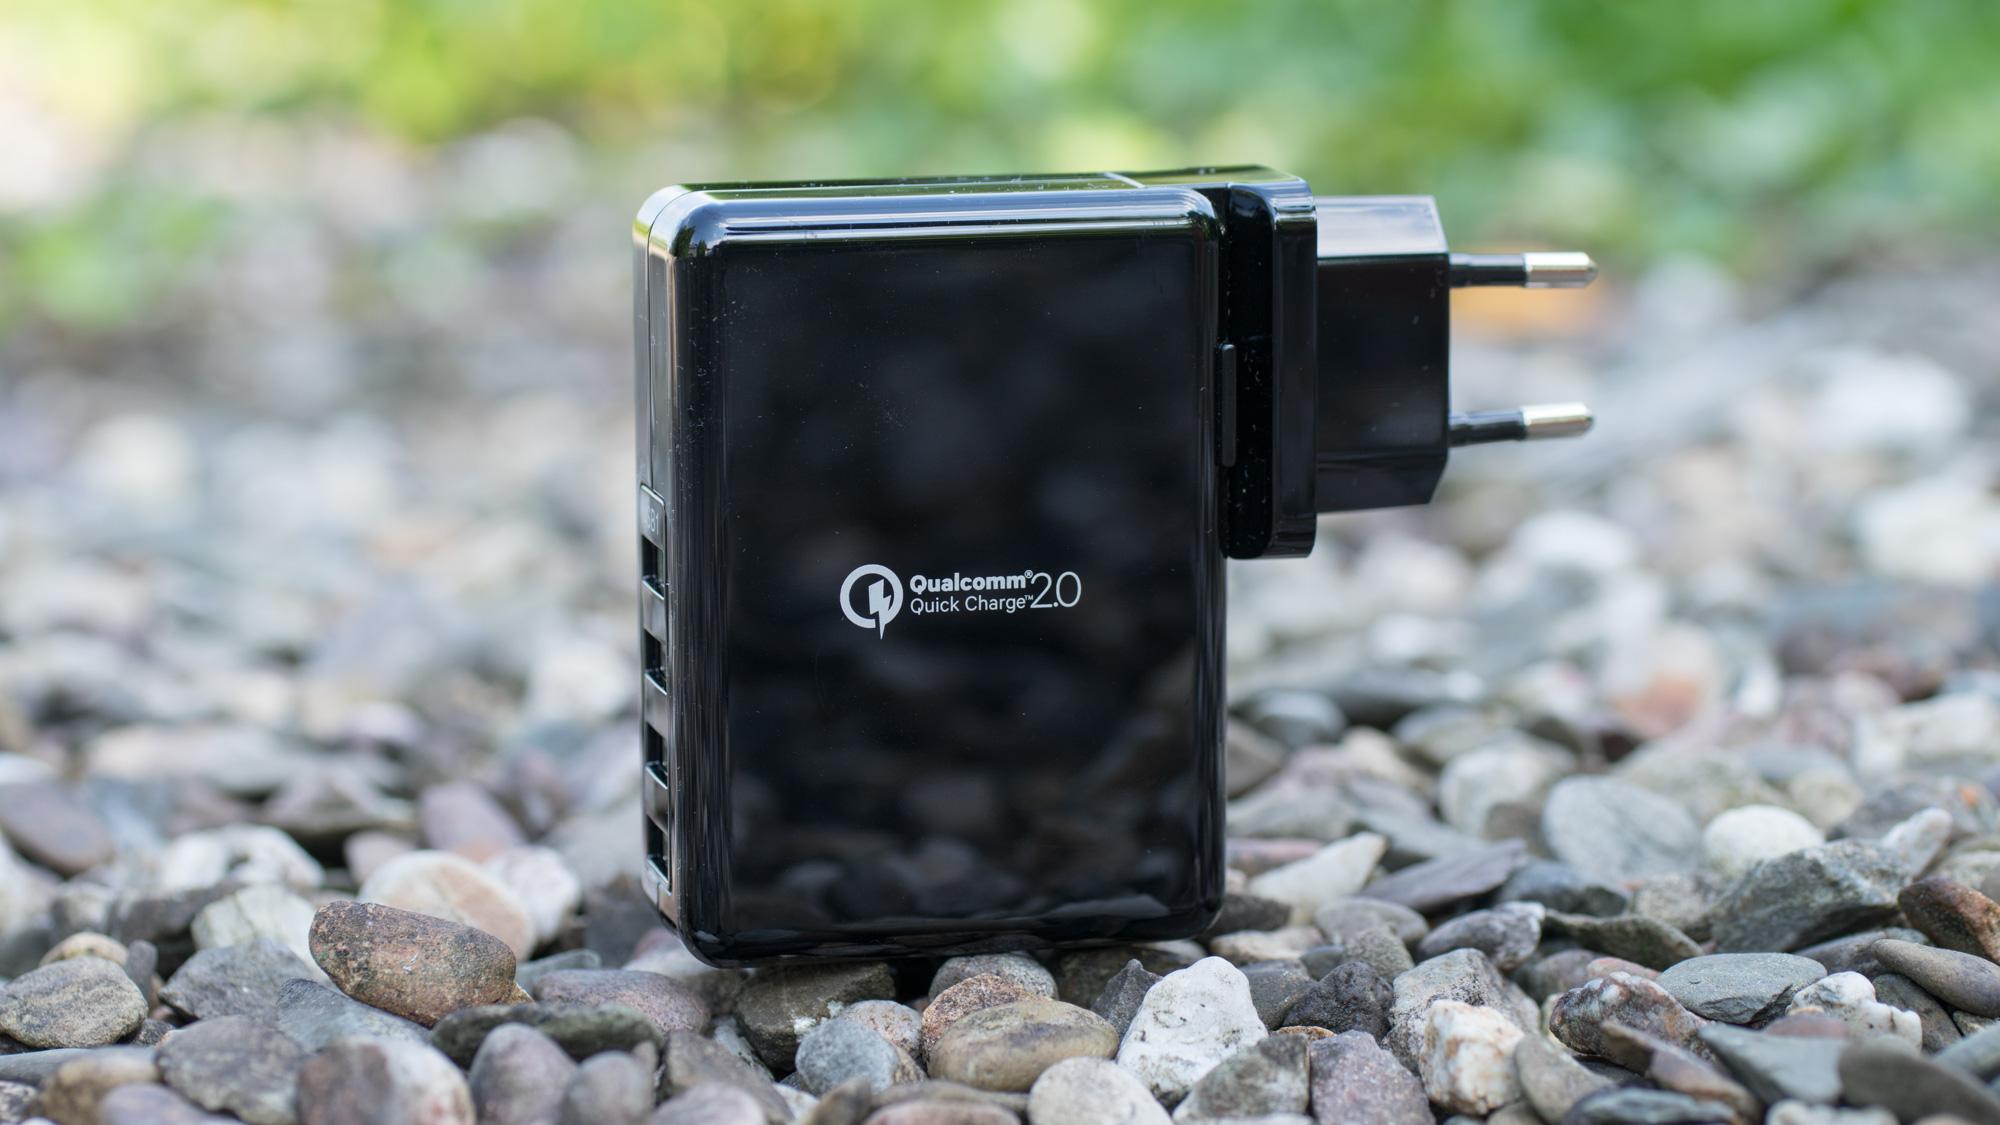 Poweradd Qualcomm Quick Charge 2.0 Ladegerät im Test